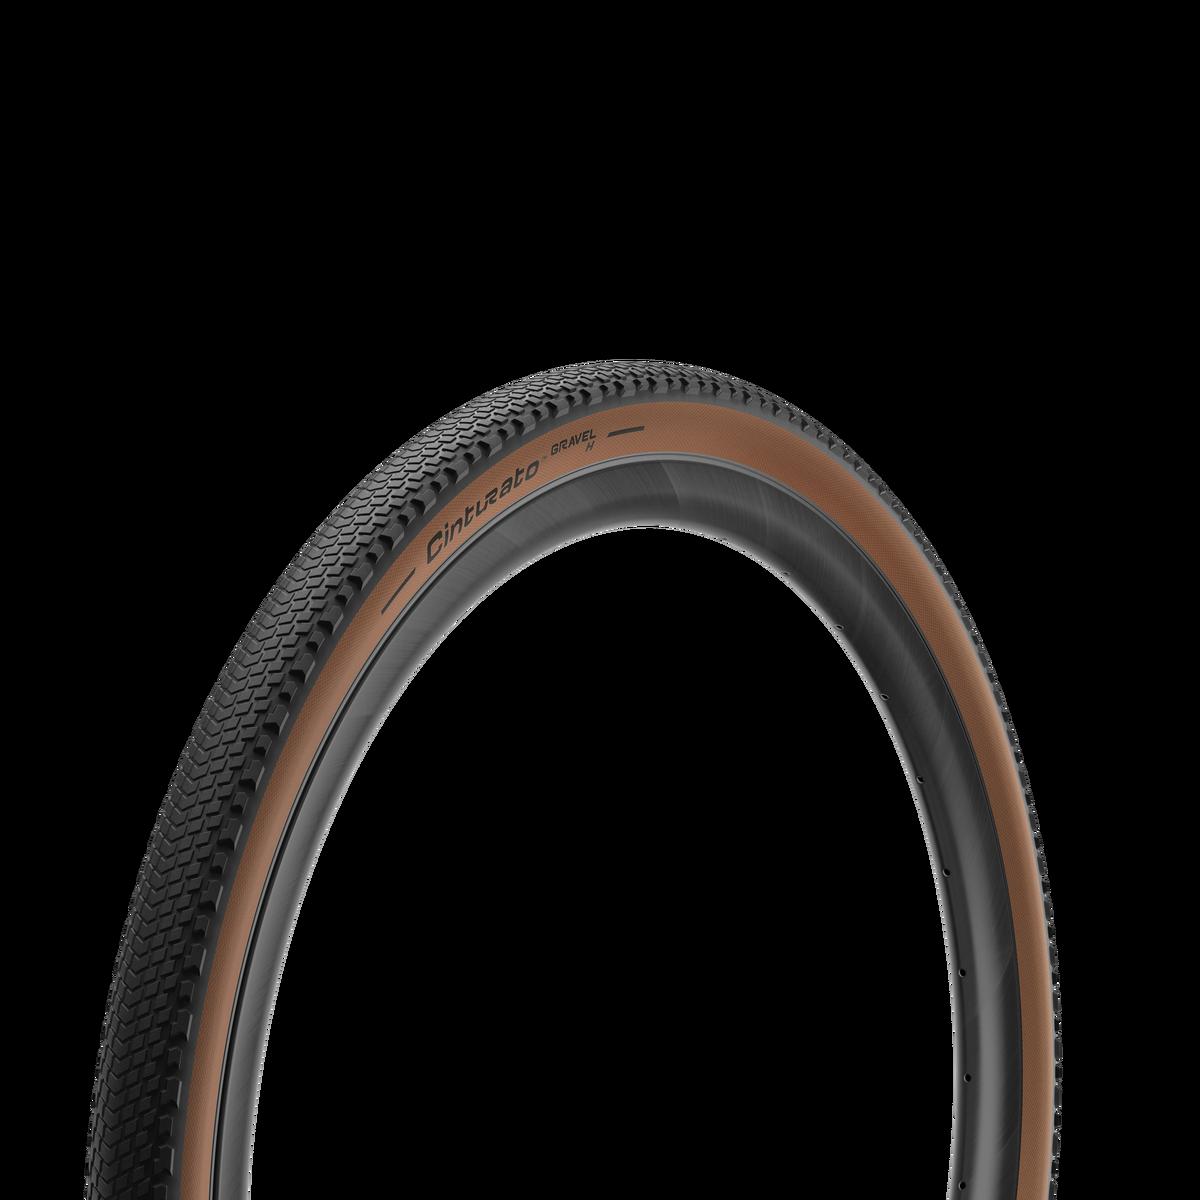 Plášť Pirelli Cinturato™ GRAVEL H Classic 40-622